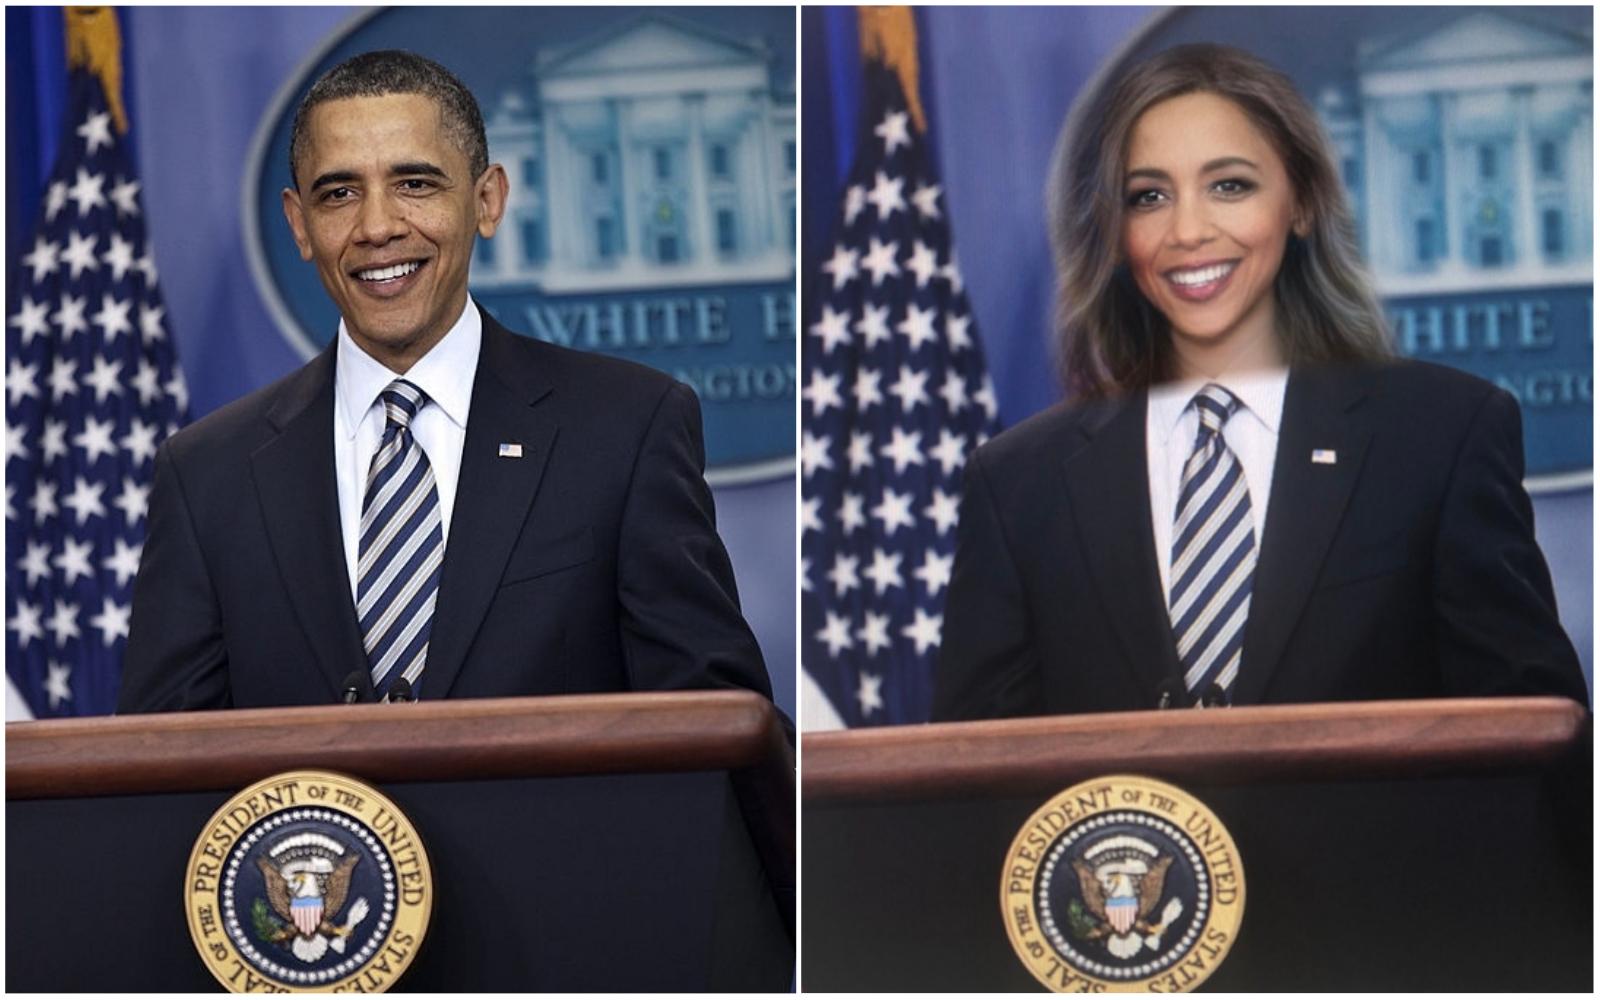 Snapchat filter on presidents